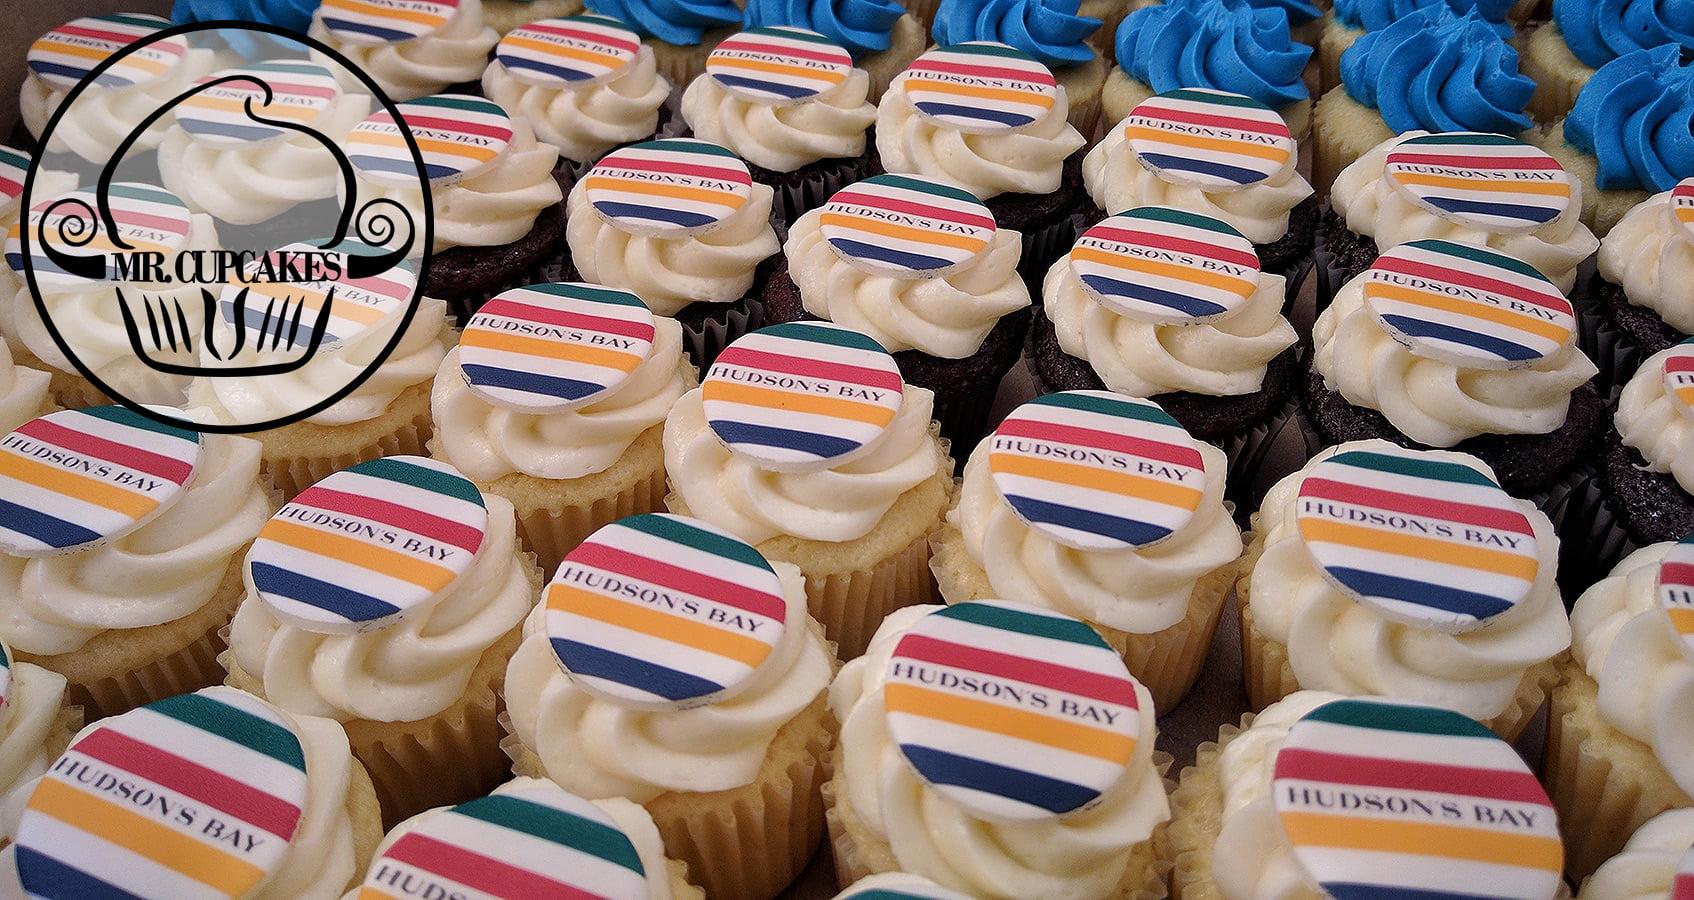 Hudson's Bay Cupcakes